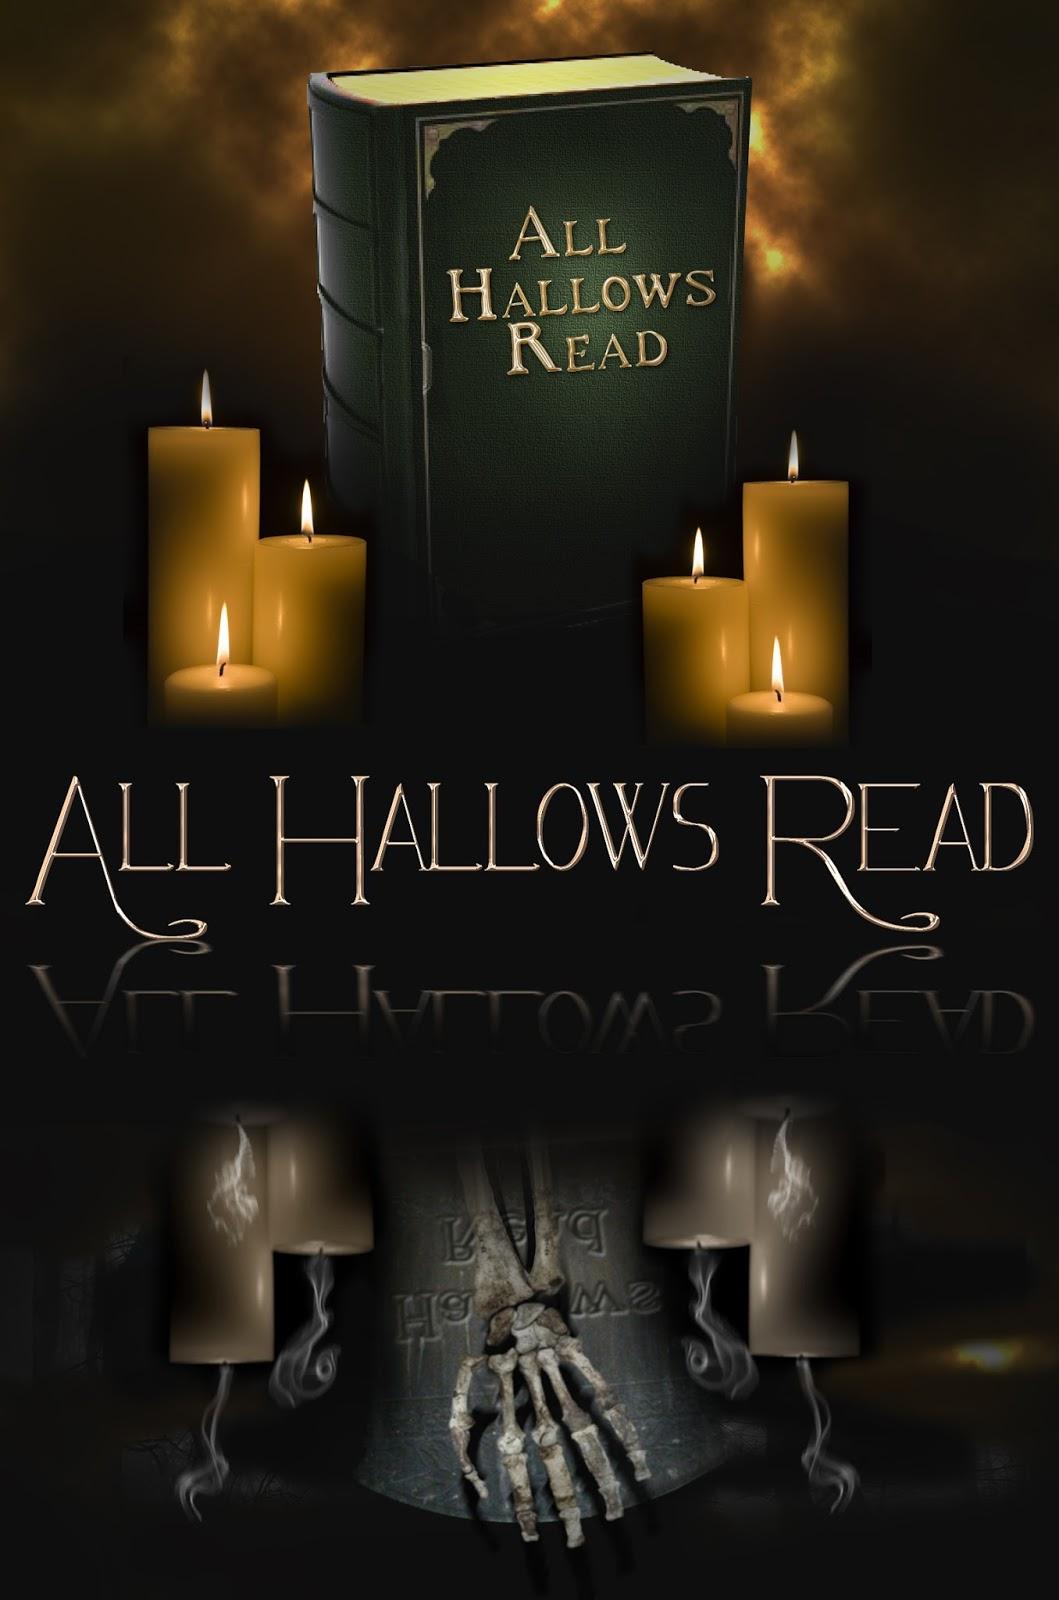 All Hallows' Read 2014